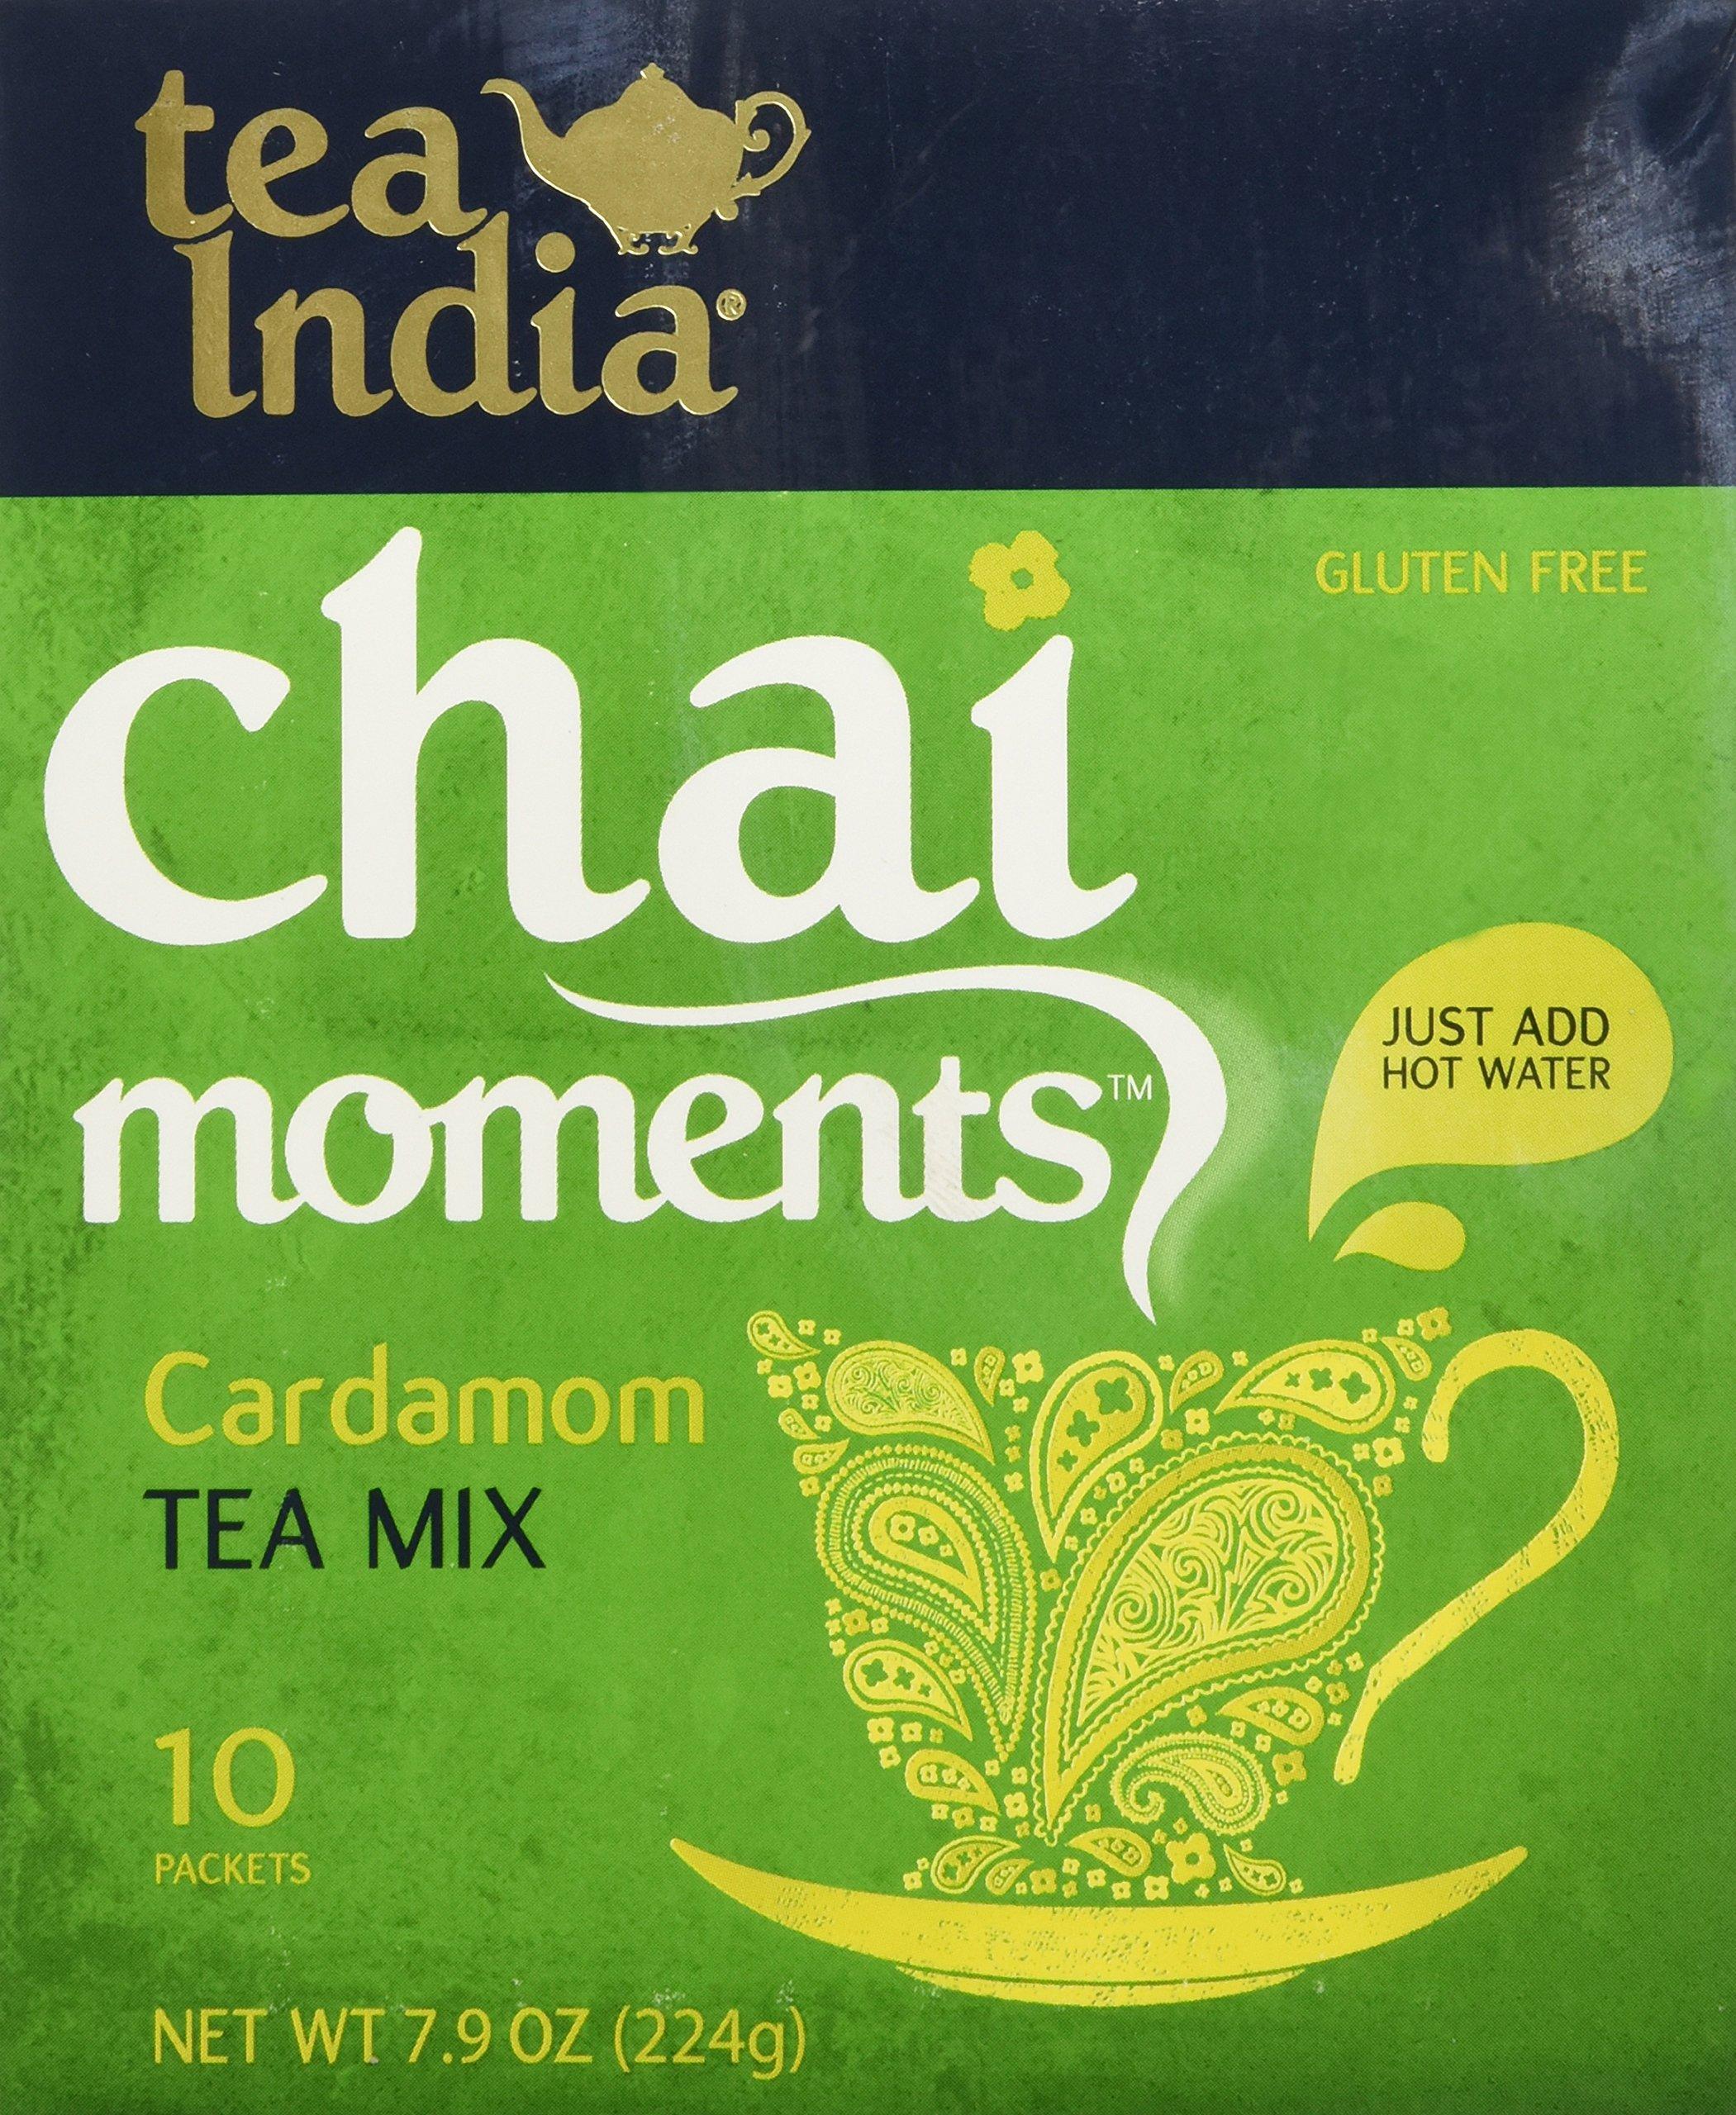 Tea India Cardamom Tea Mix - Chai Moments Cardamom Tea 10 Instant Tea Packets